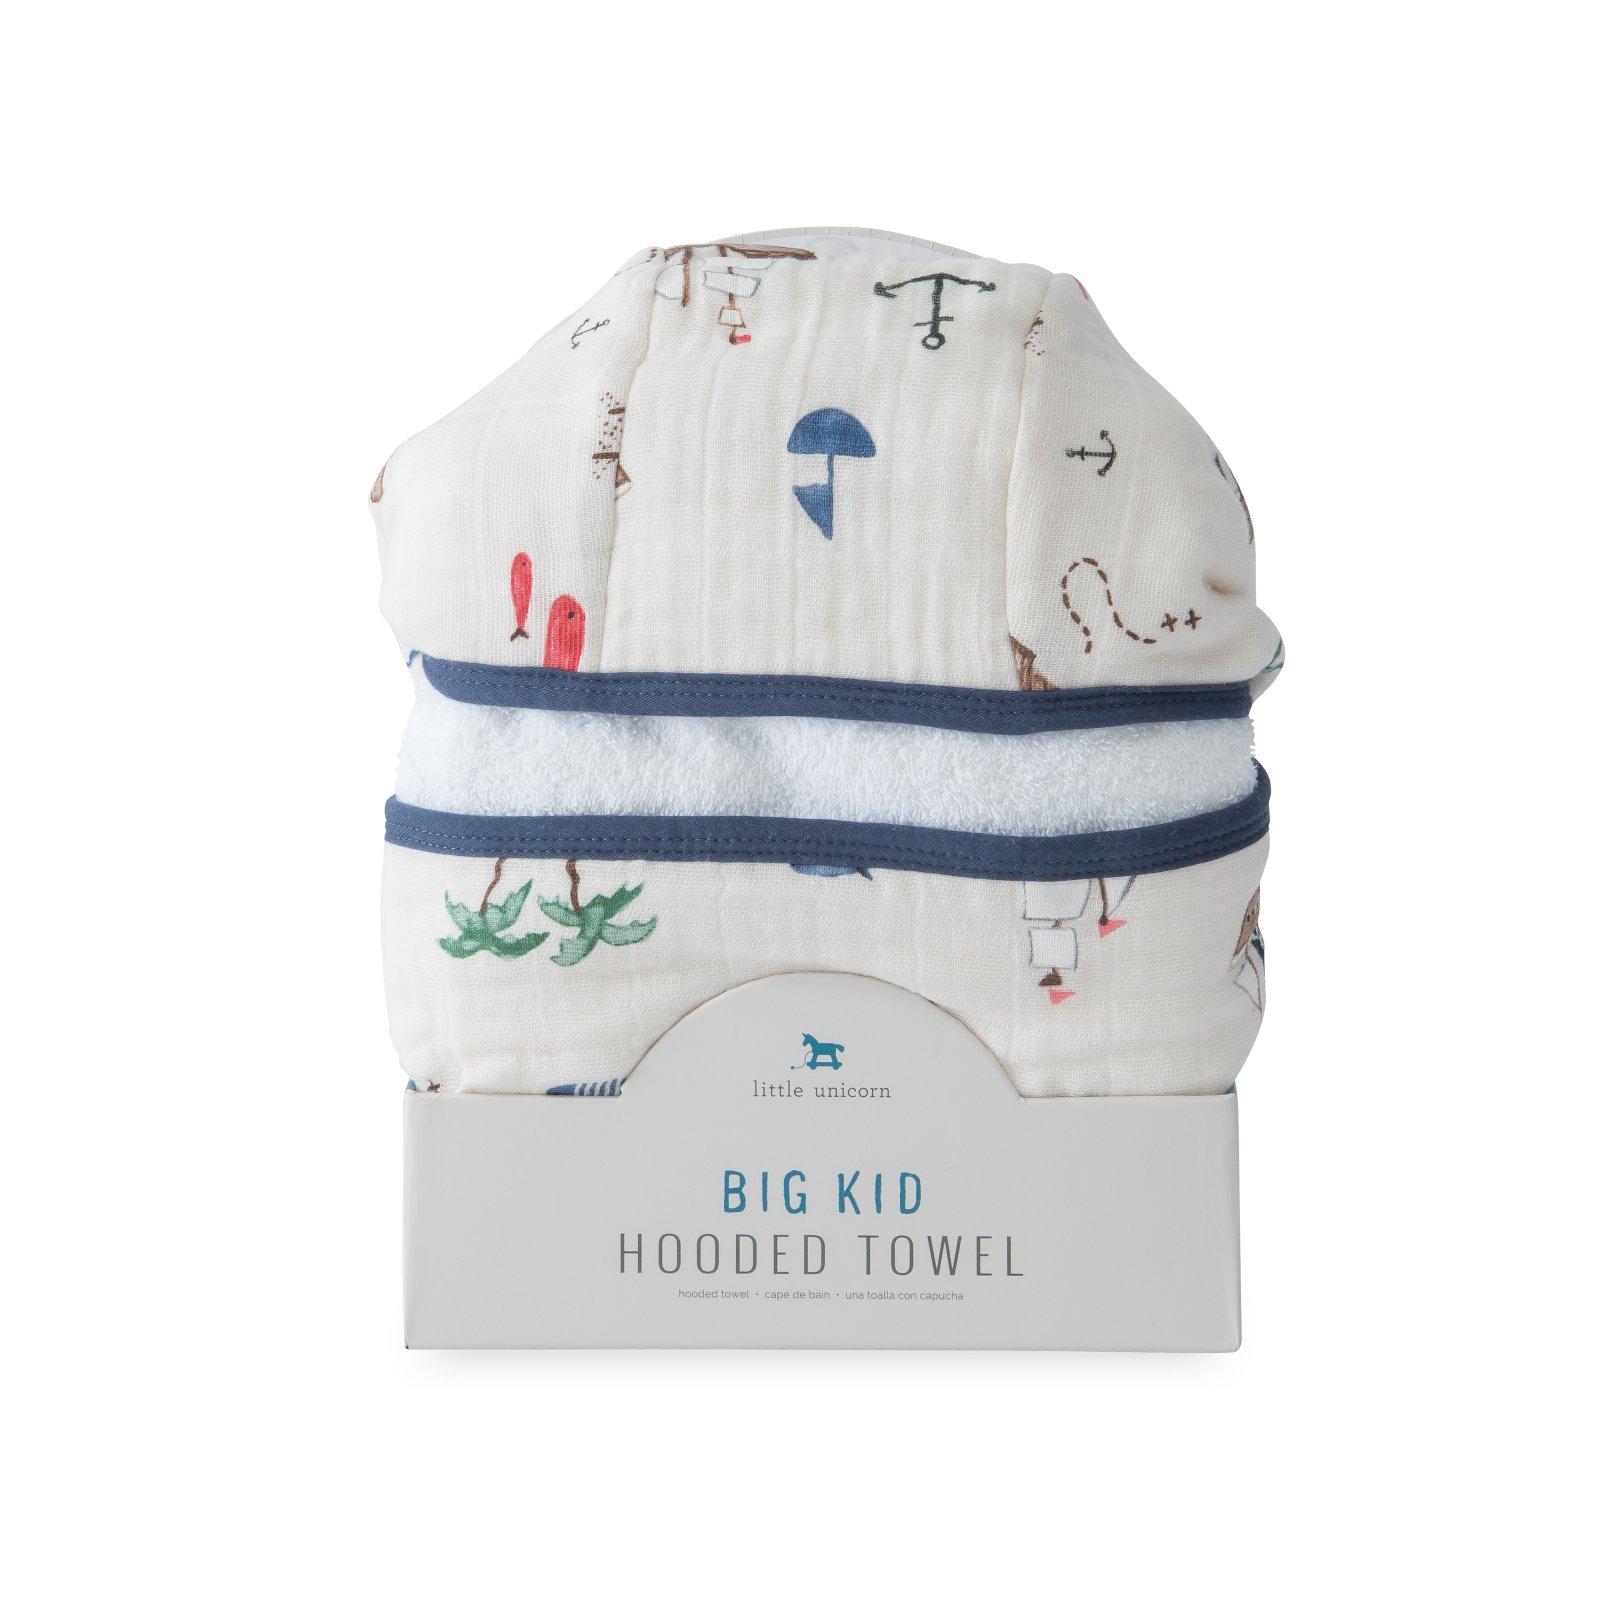 Little Unicorn Cotton Hooded Towel Big Kid - Treasure Map